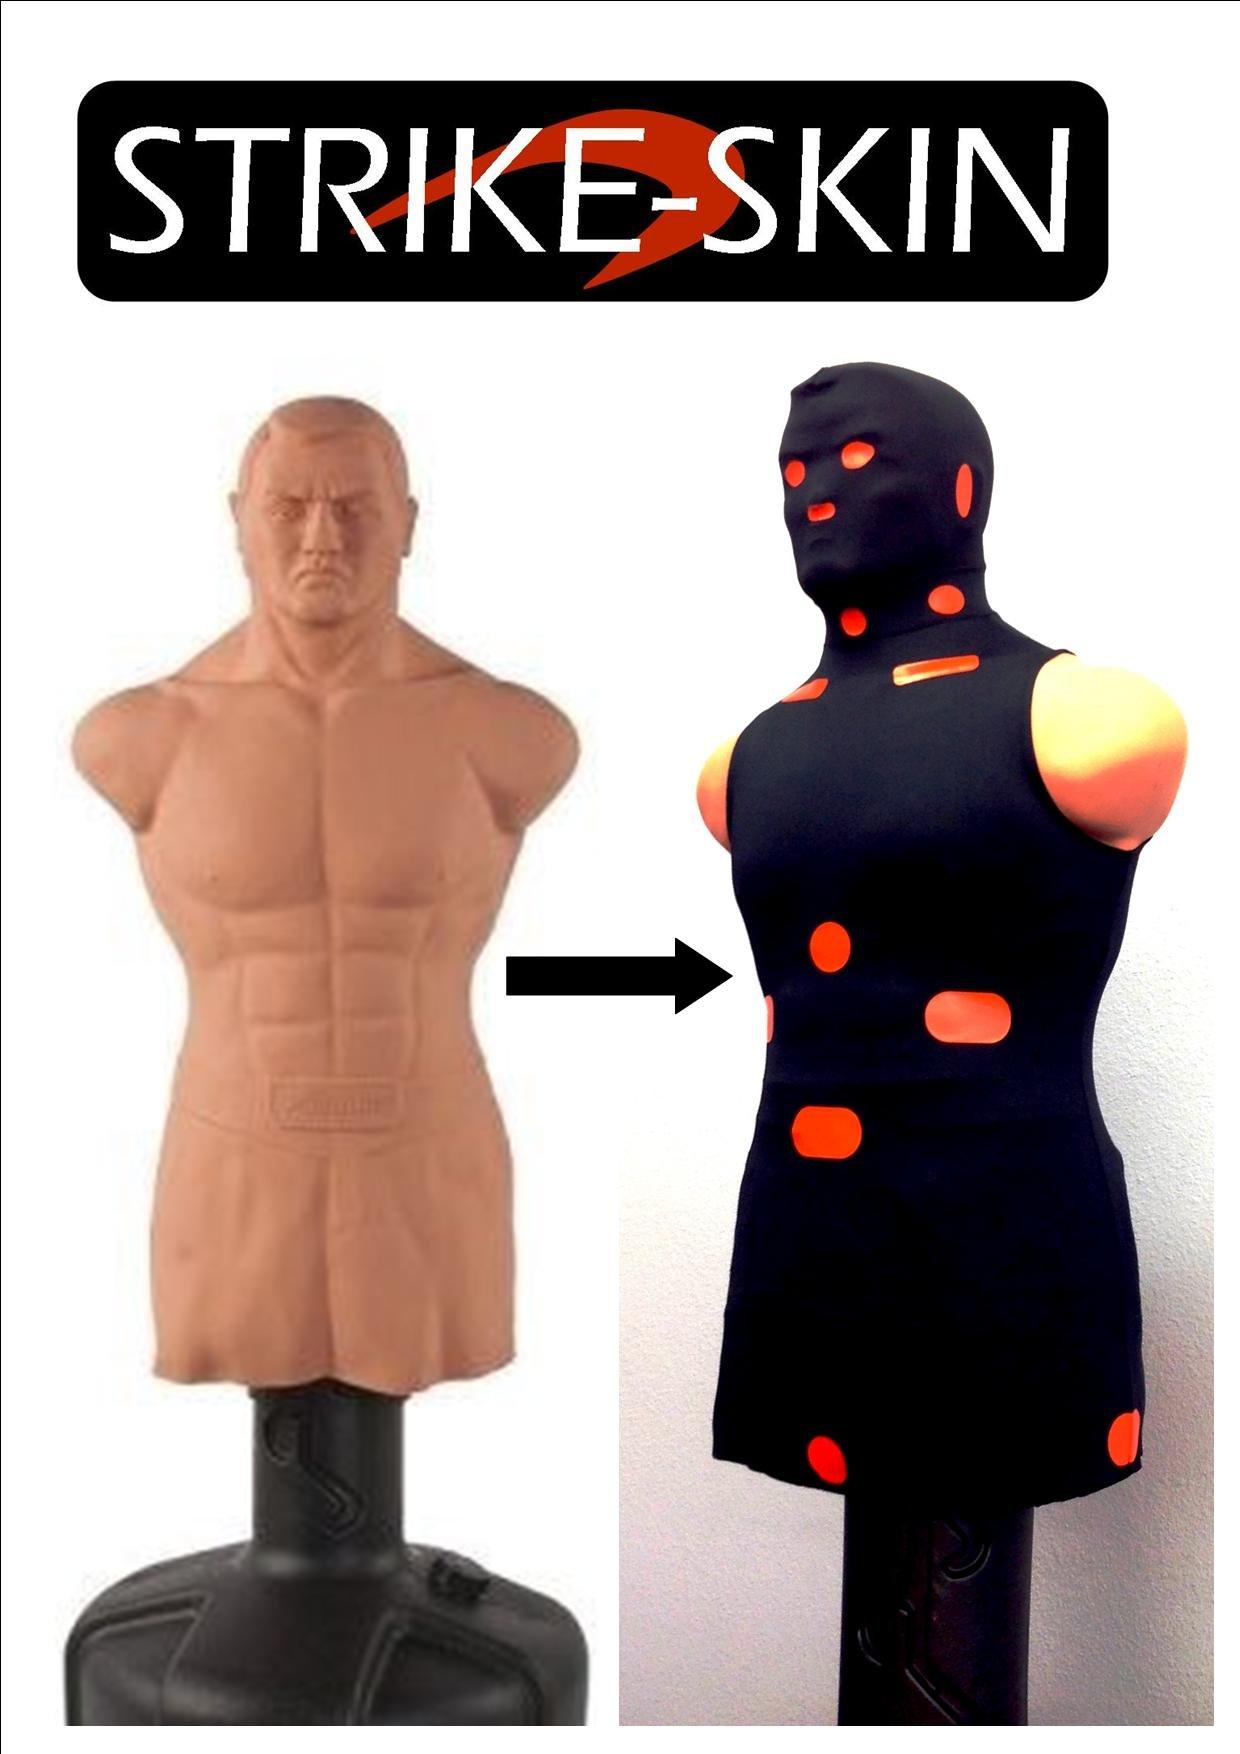 Strike-Skin Self Defense Training Aide ***BOB Punching Bag NOT Included